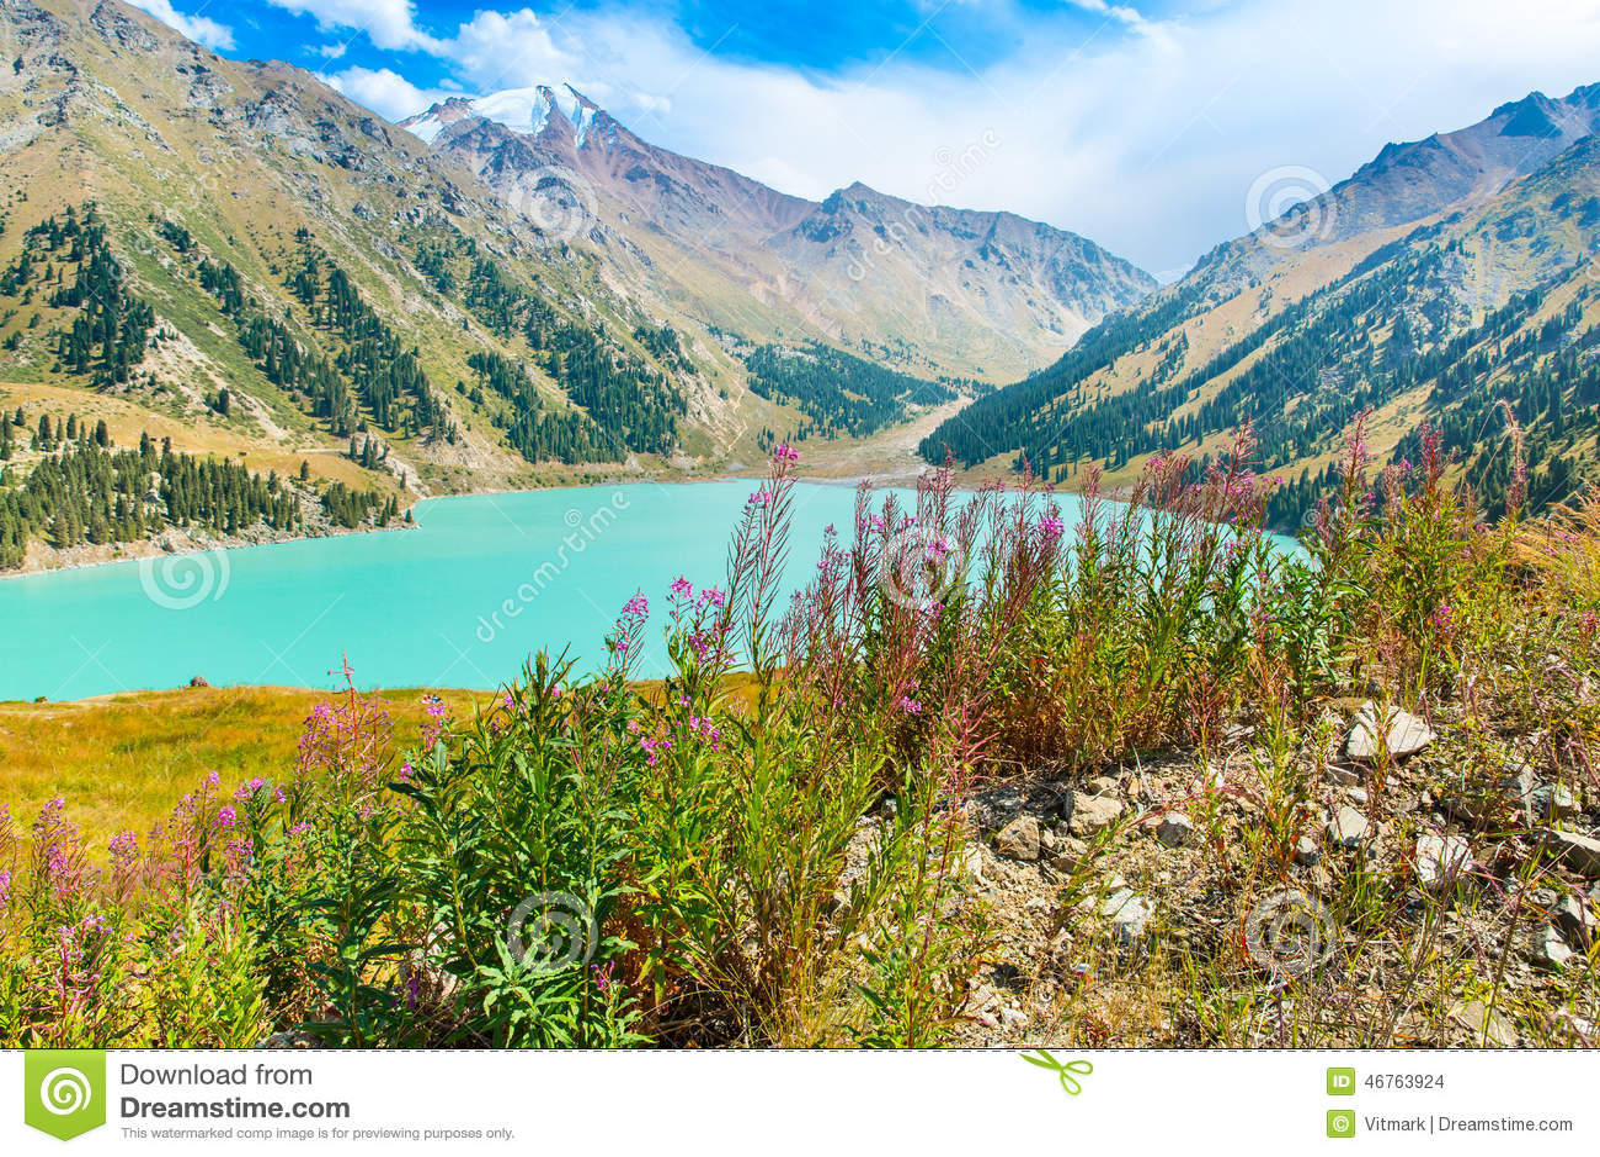 Spectacular scenic Big Almaty Lake ,Tien Shan Mountains in Almaty, Kazakhstan